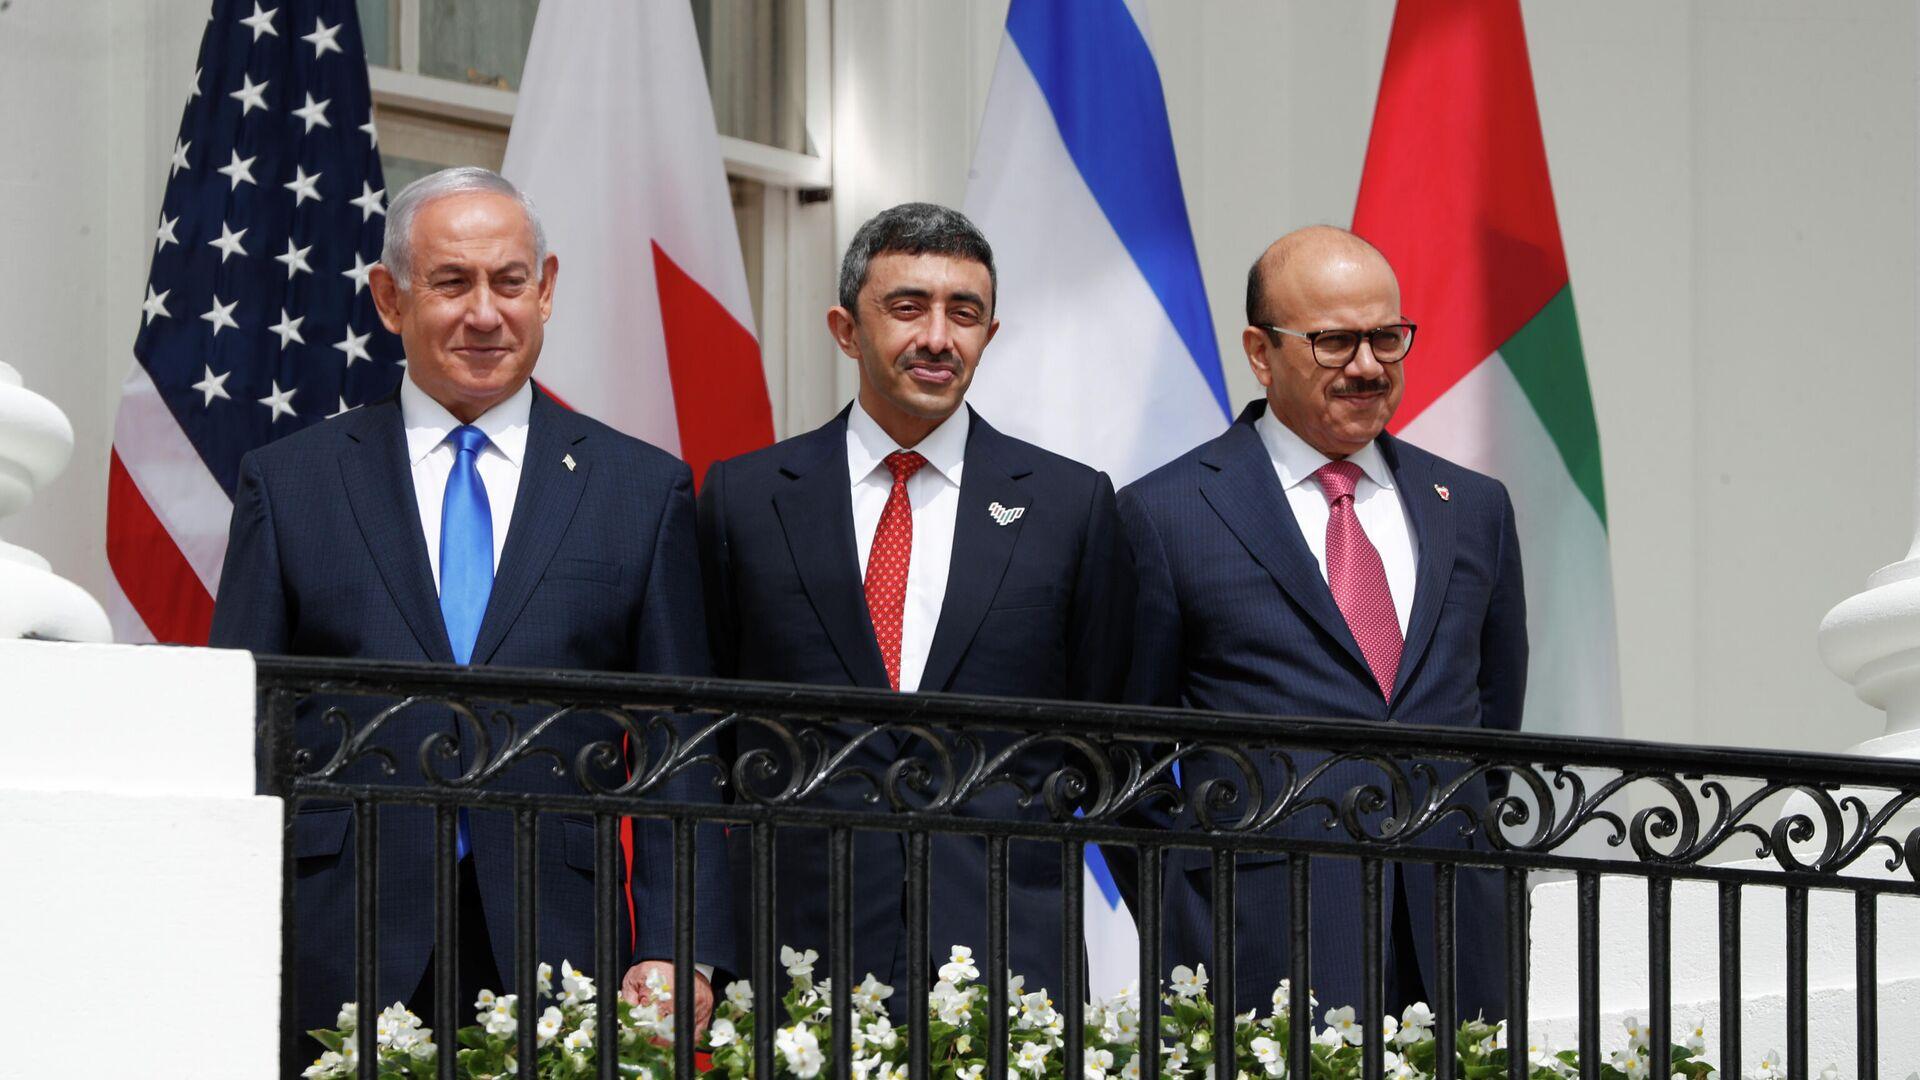 Биньямин Нетаньяху, Абдалла бен Зейд аль-Нахайян и Абдуллатиф Аль Зайани перед подписанием договора в Белом доме США - РИА Новости, 1920, 16.09.2020